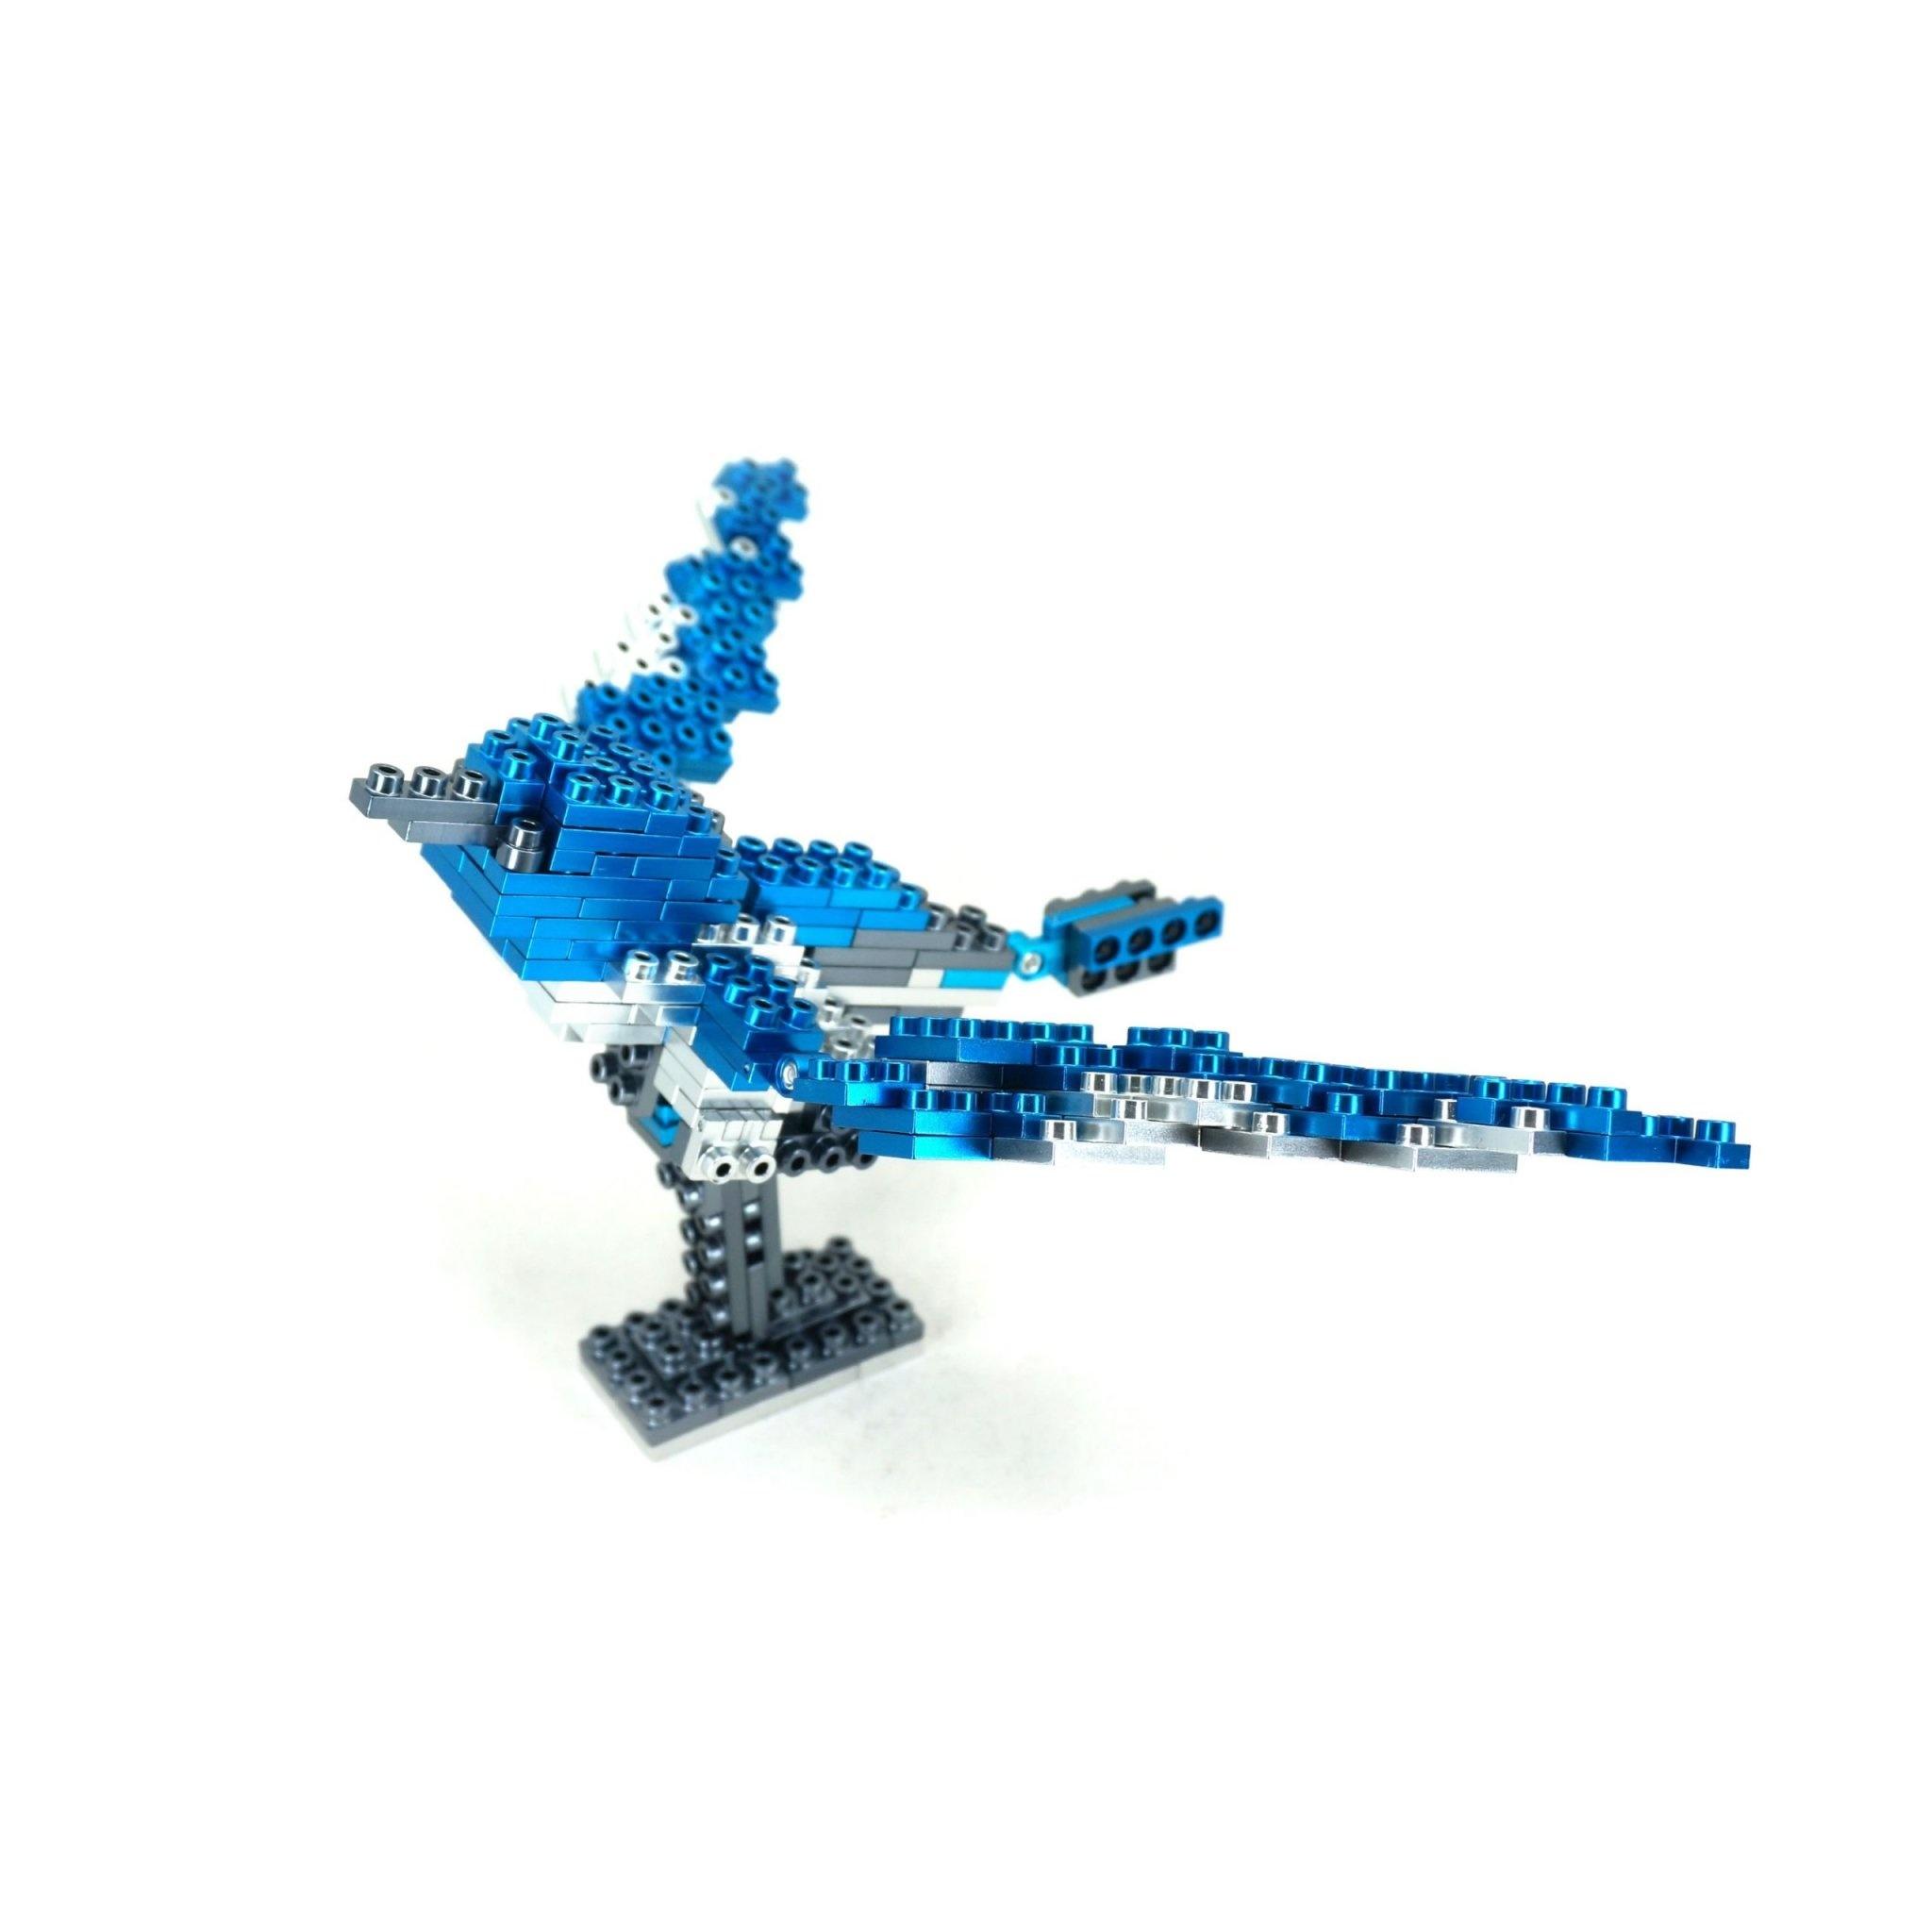 3-in-1 Series 1 Azure Blue by Metomics